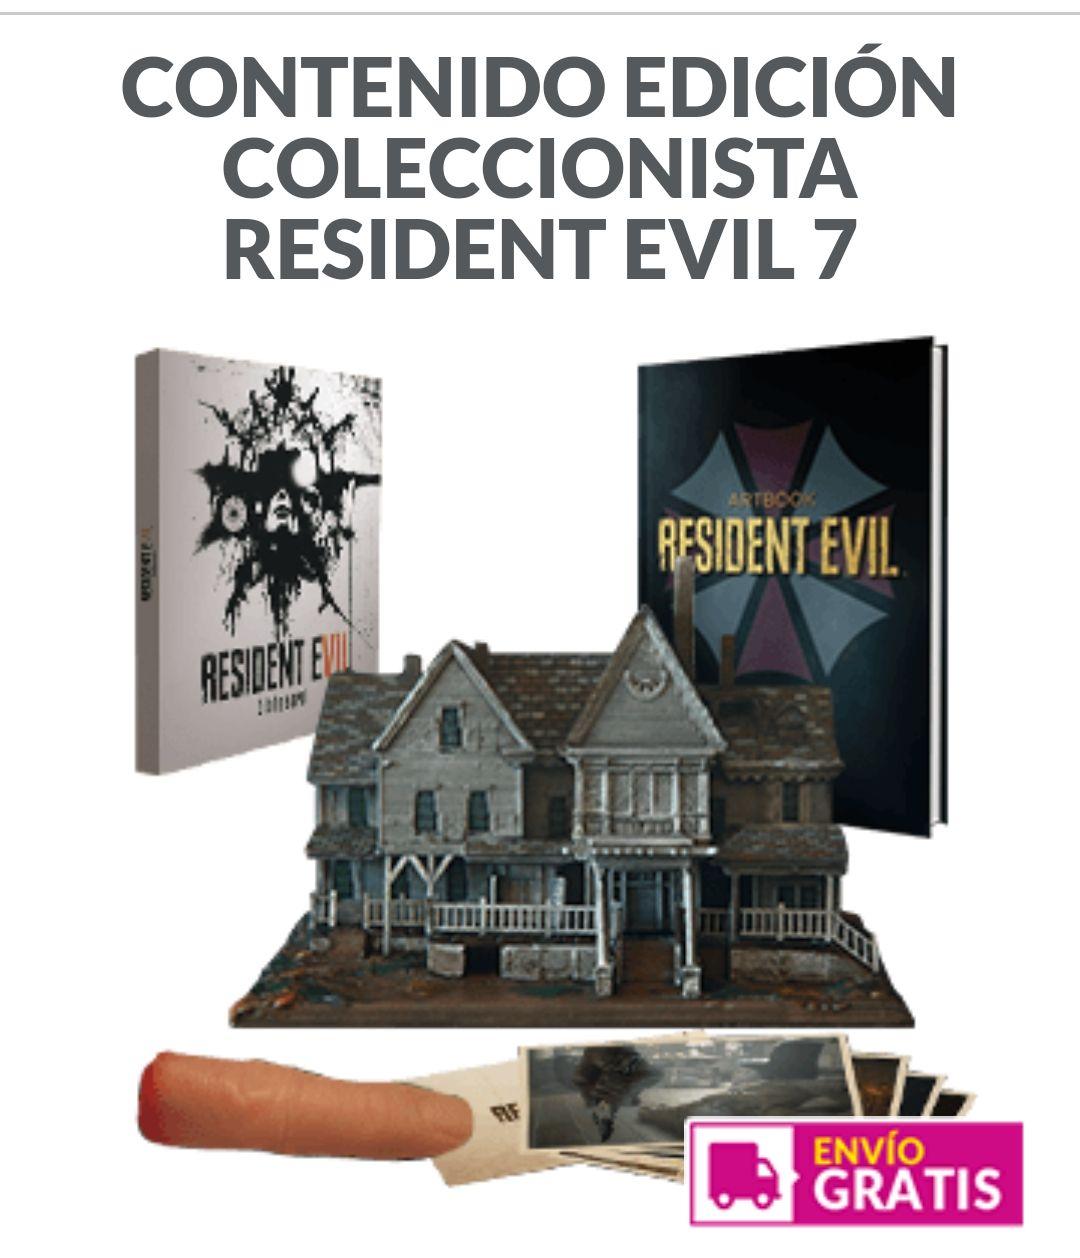 EDICIÓN COLECCIONISTA RESIDENT EVIL 7